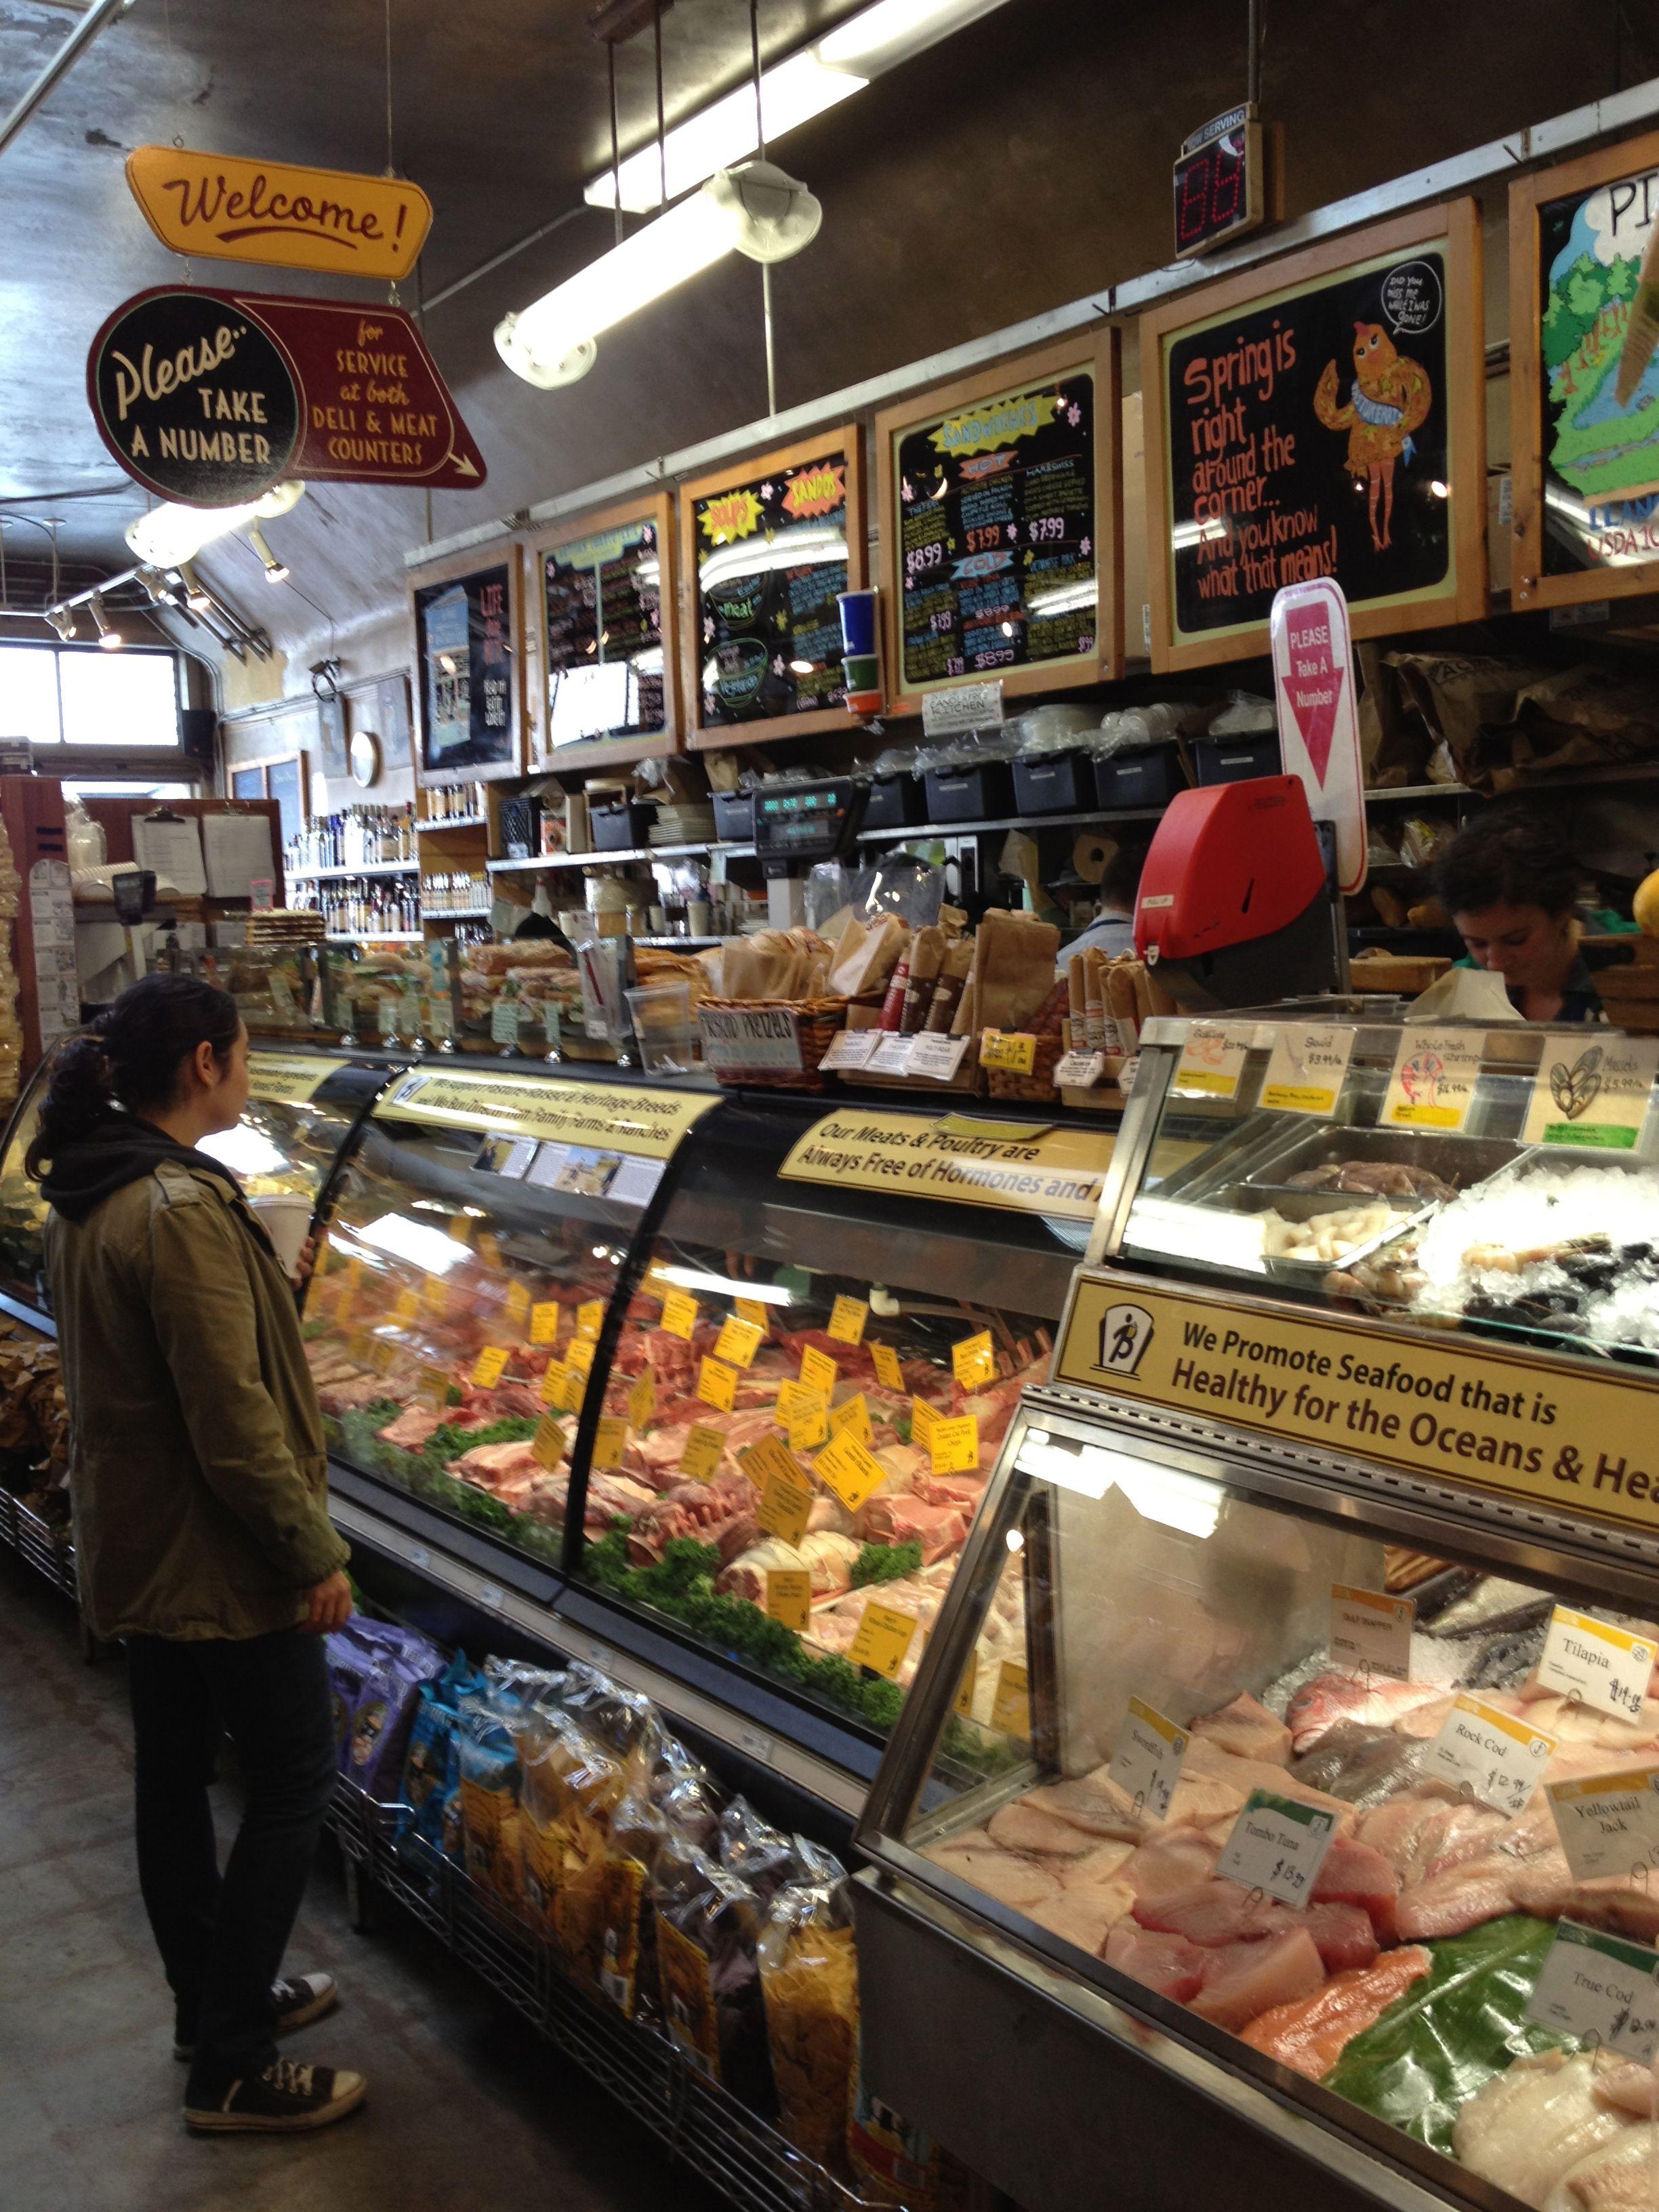 Bi Rite Market Sf Signage And Feel San Francisco Food Picnic Food Market Shopping